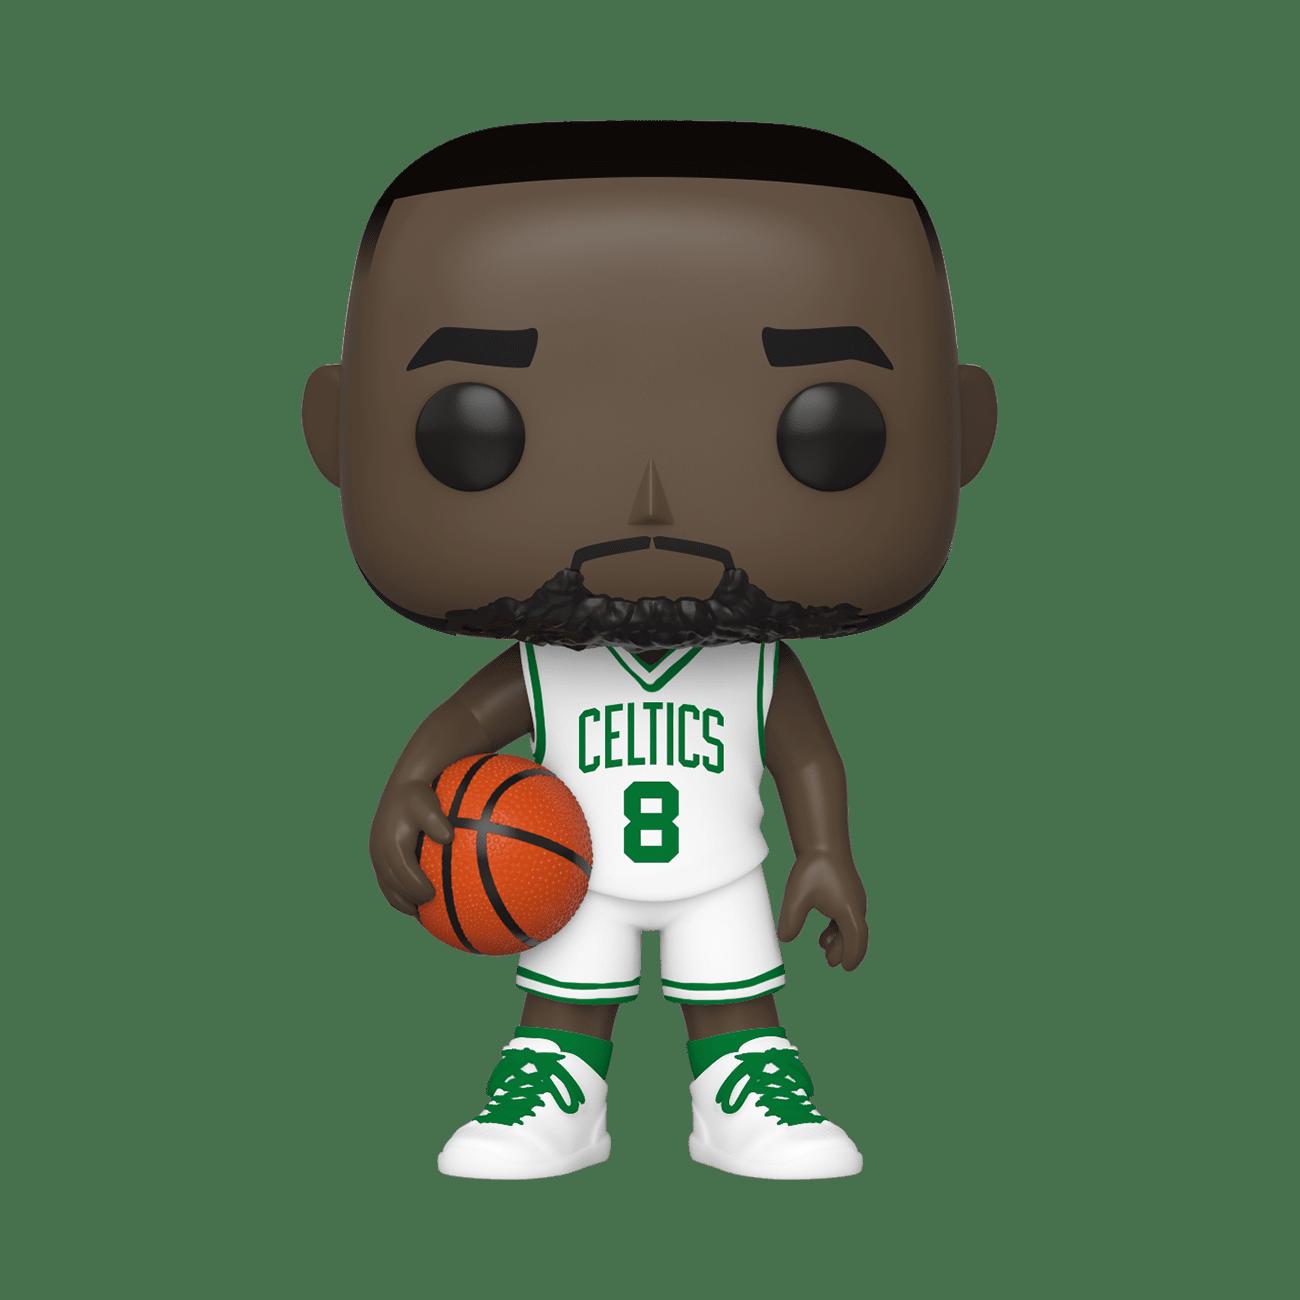 NBA: Celtics Kemba Walker POP! Vinyl Figure